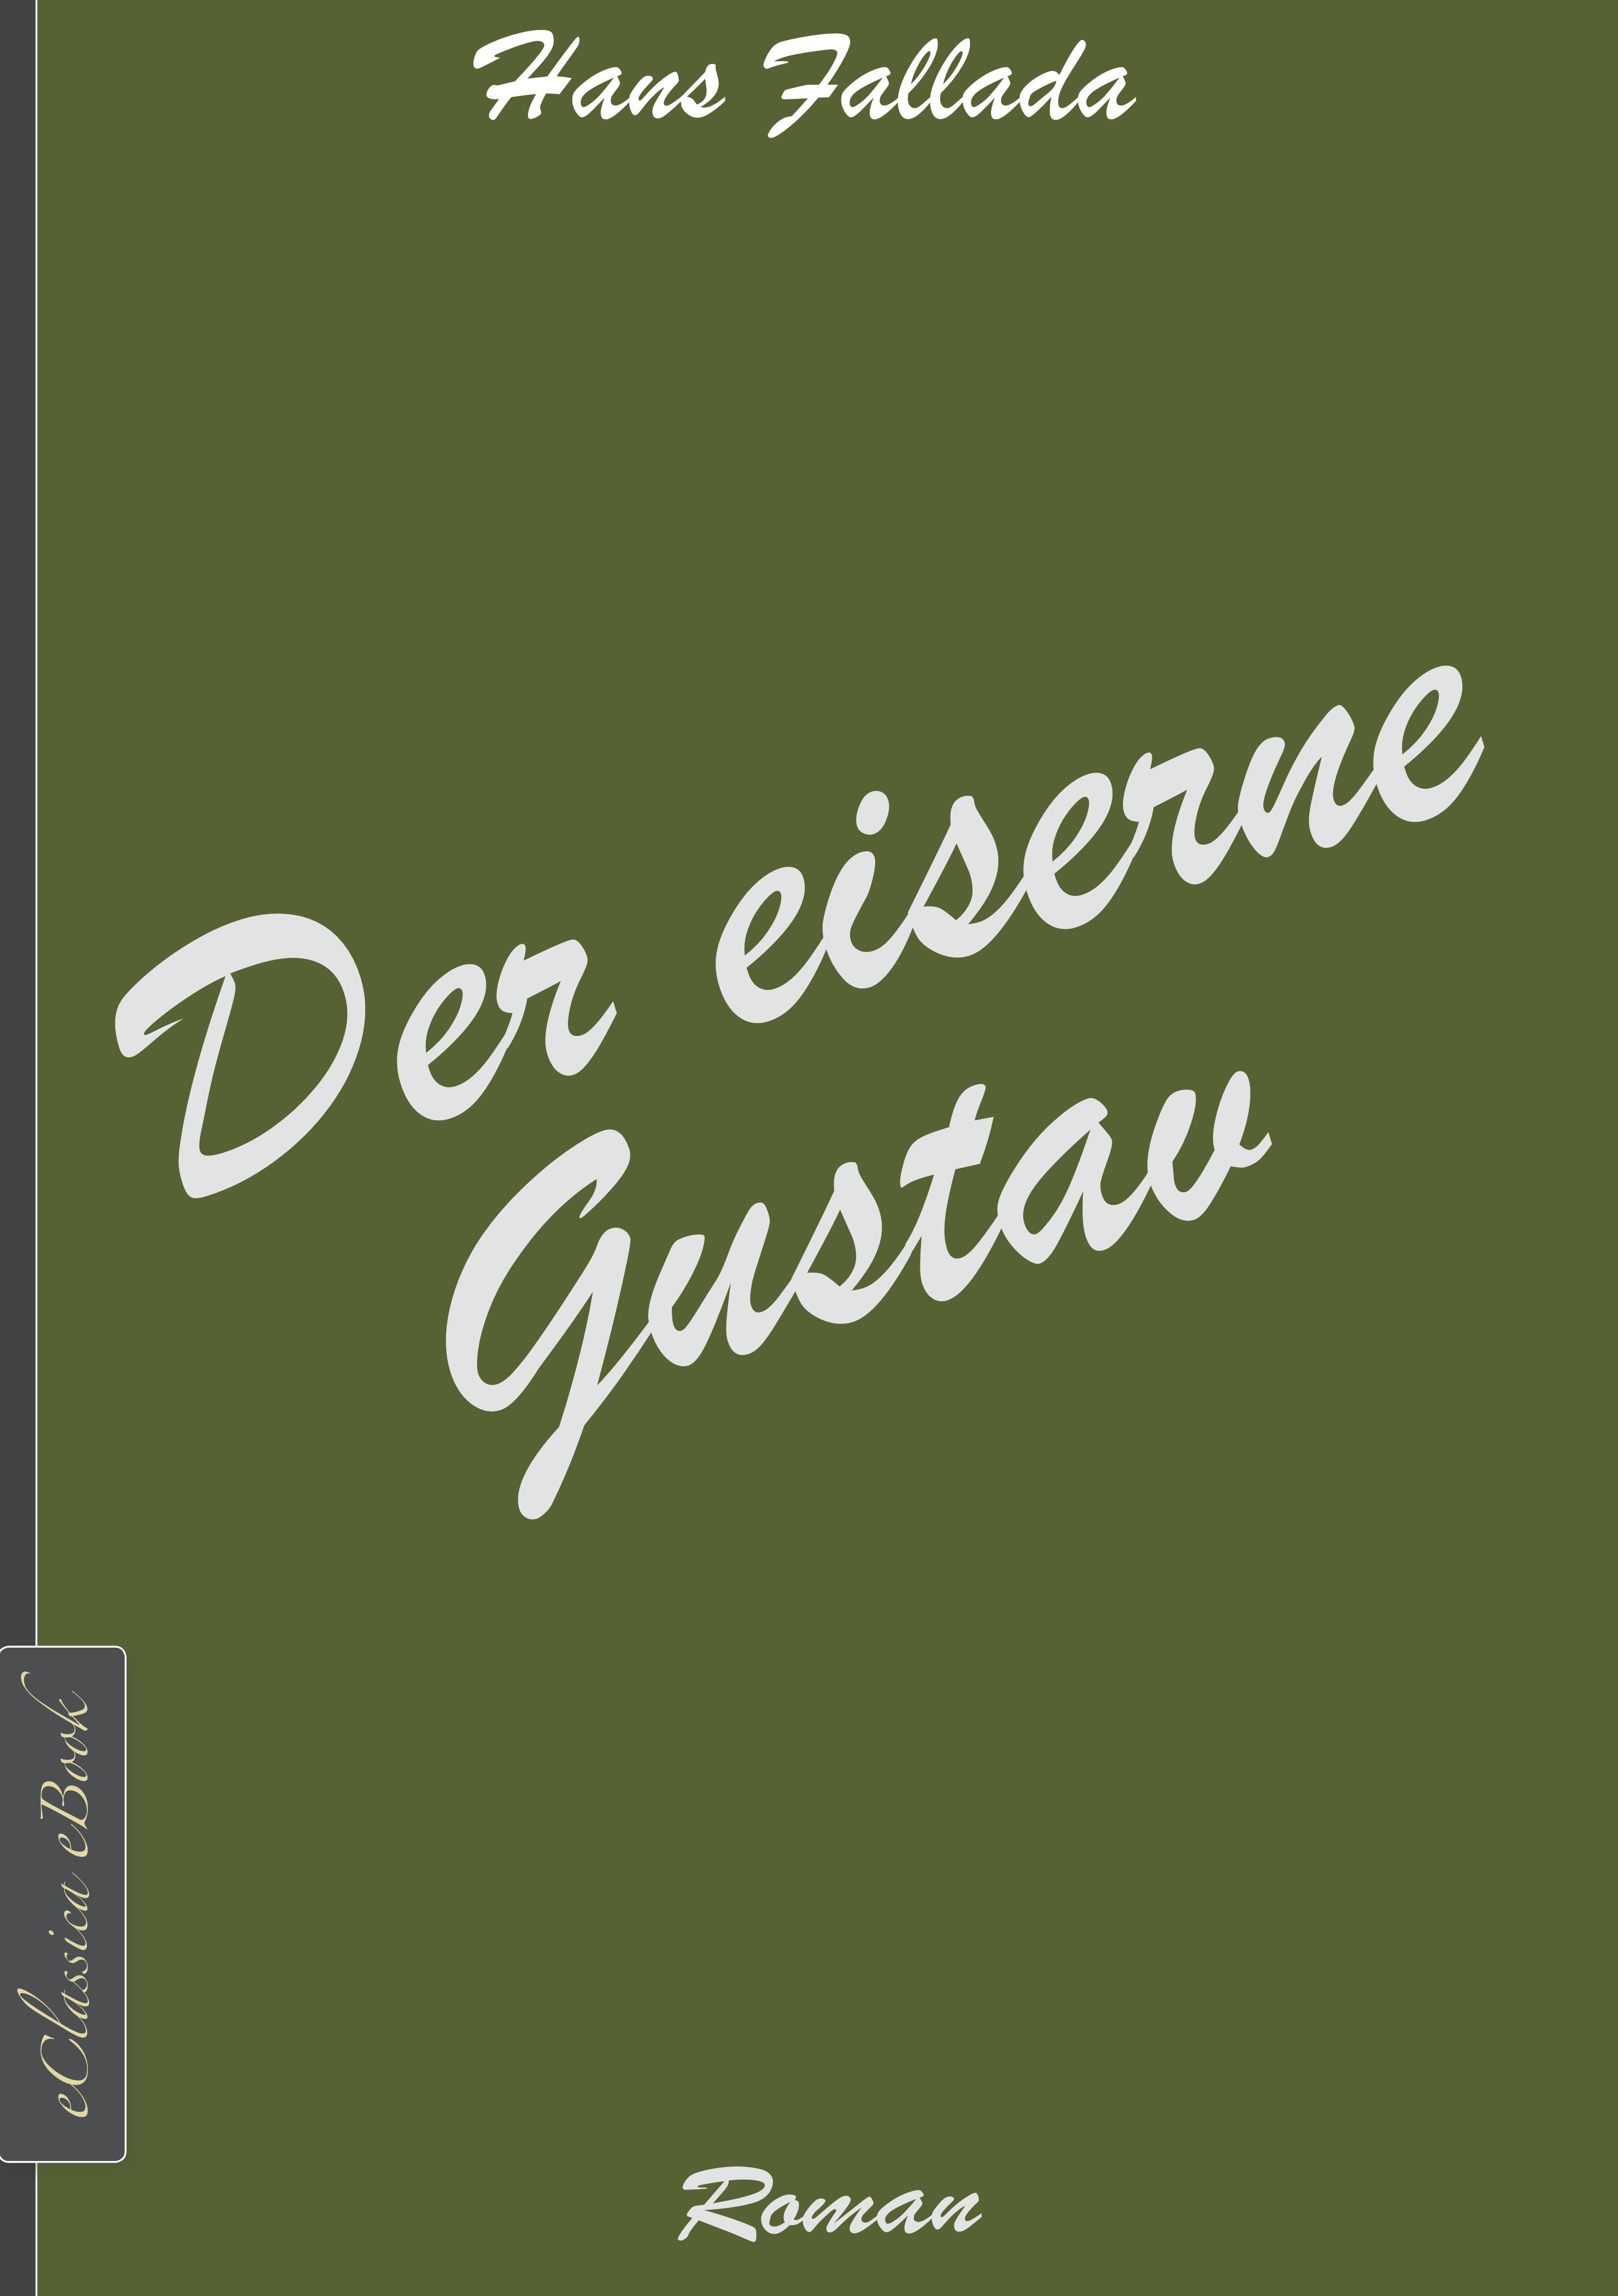 Фото - Ханс Фаллада Der eiserne Gustav клюхе ханс франция